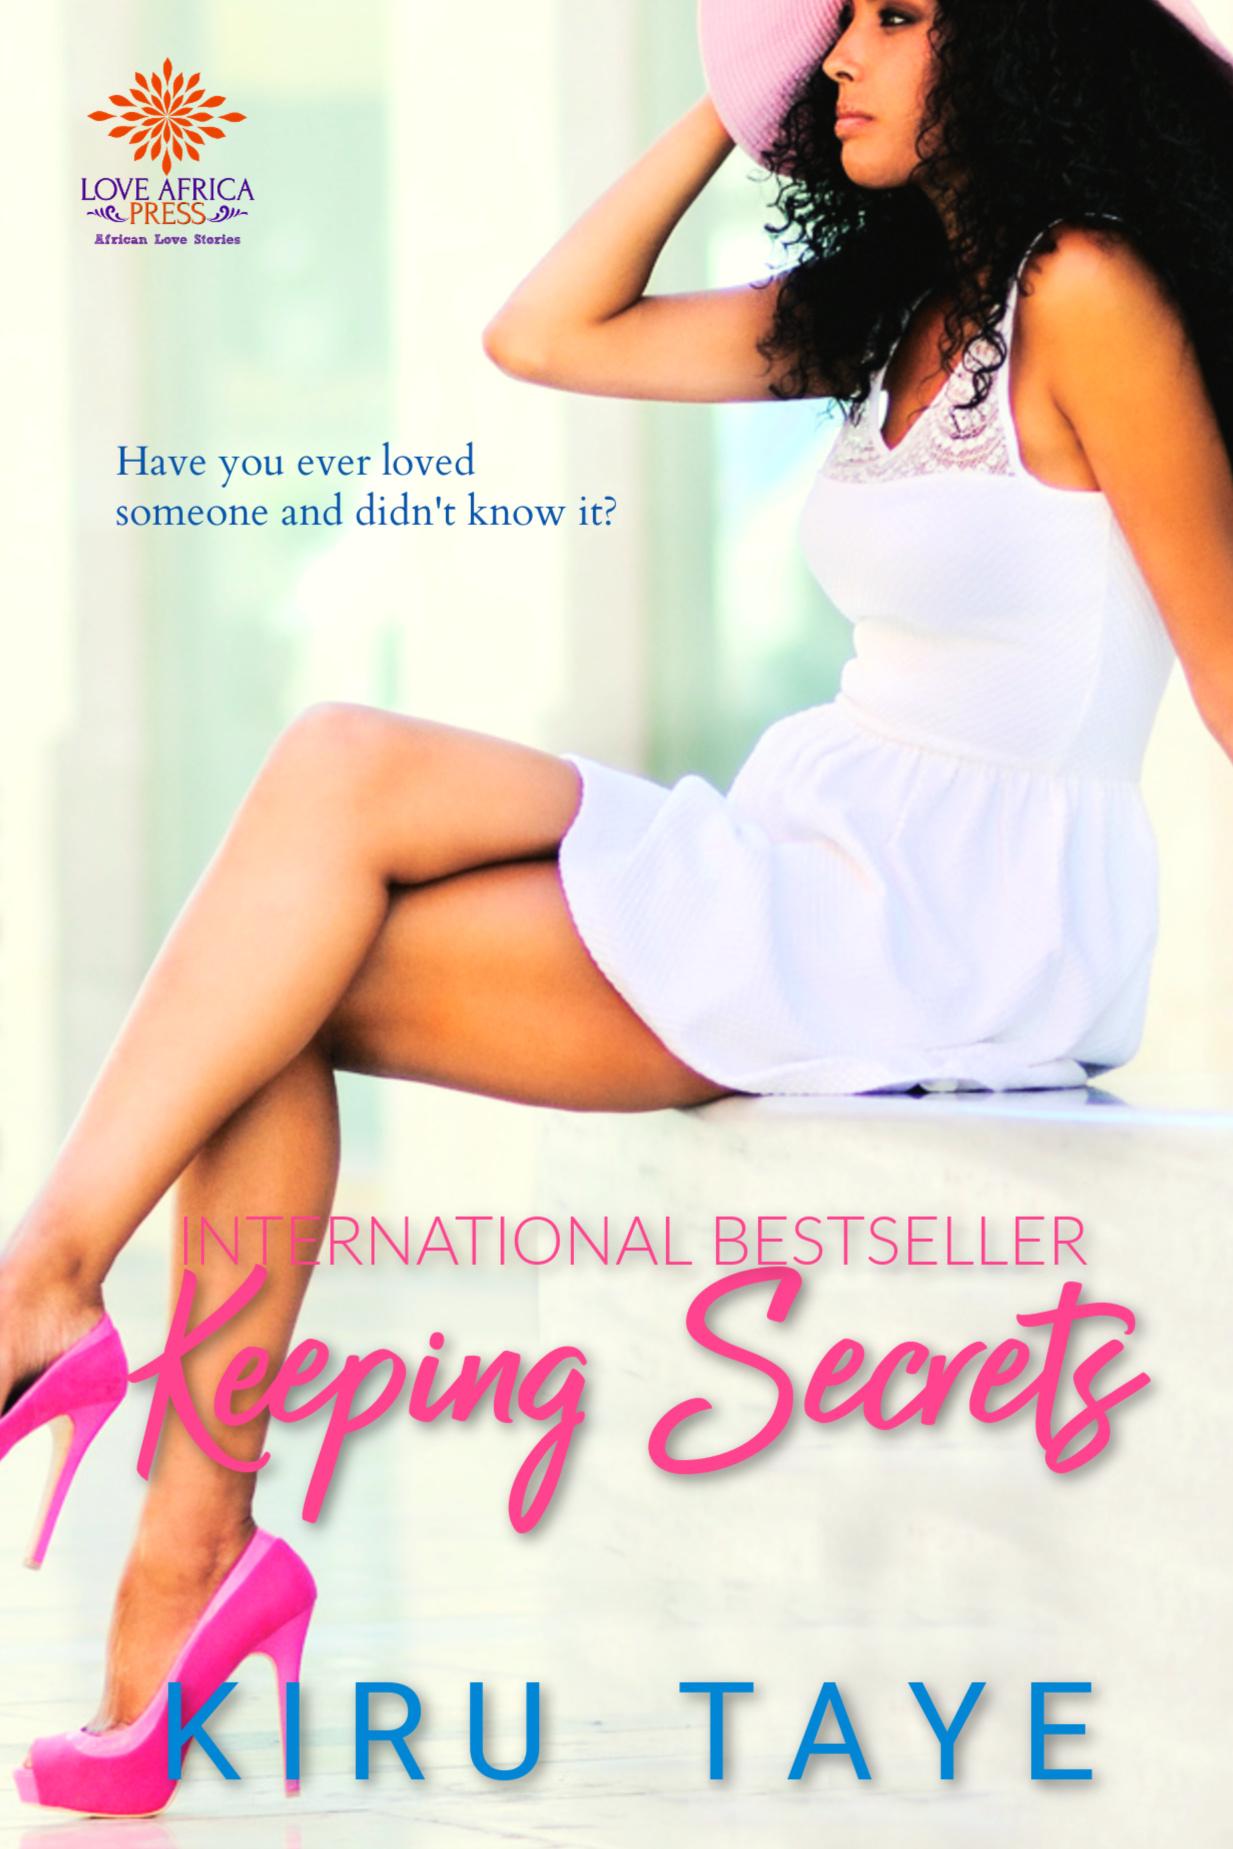 Keeping Secrets by Kiru Taye